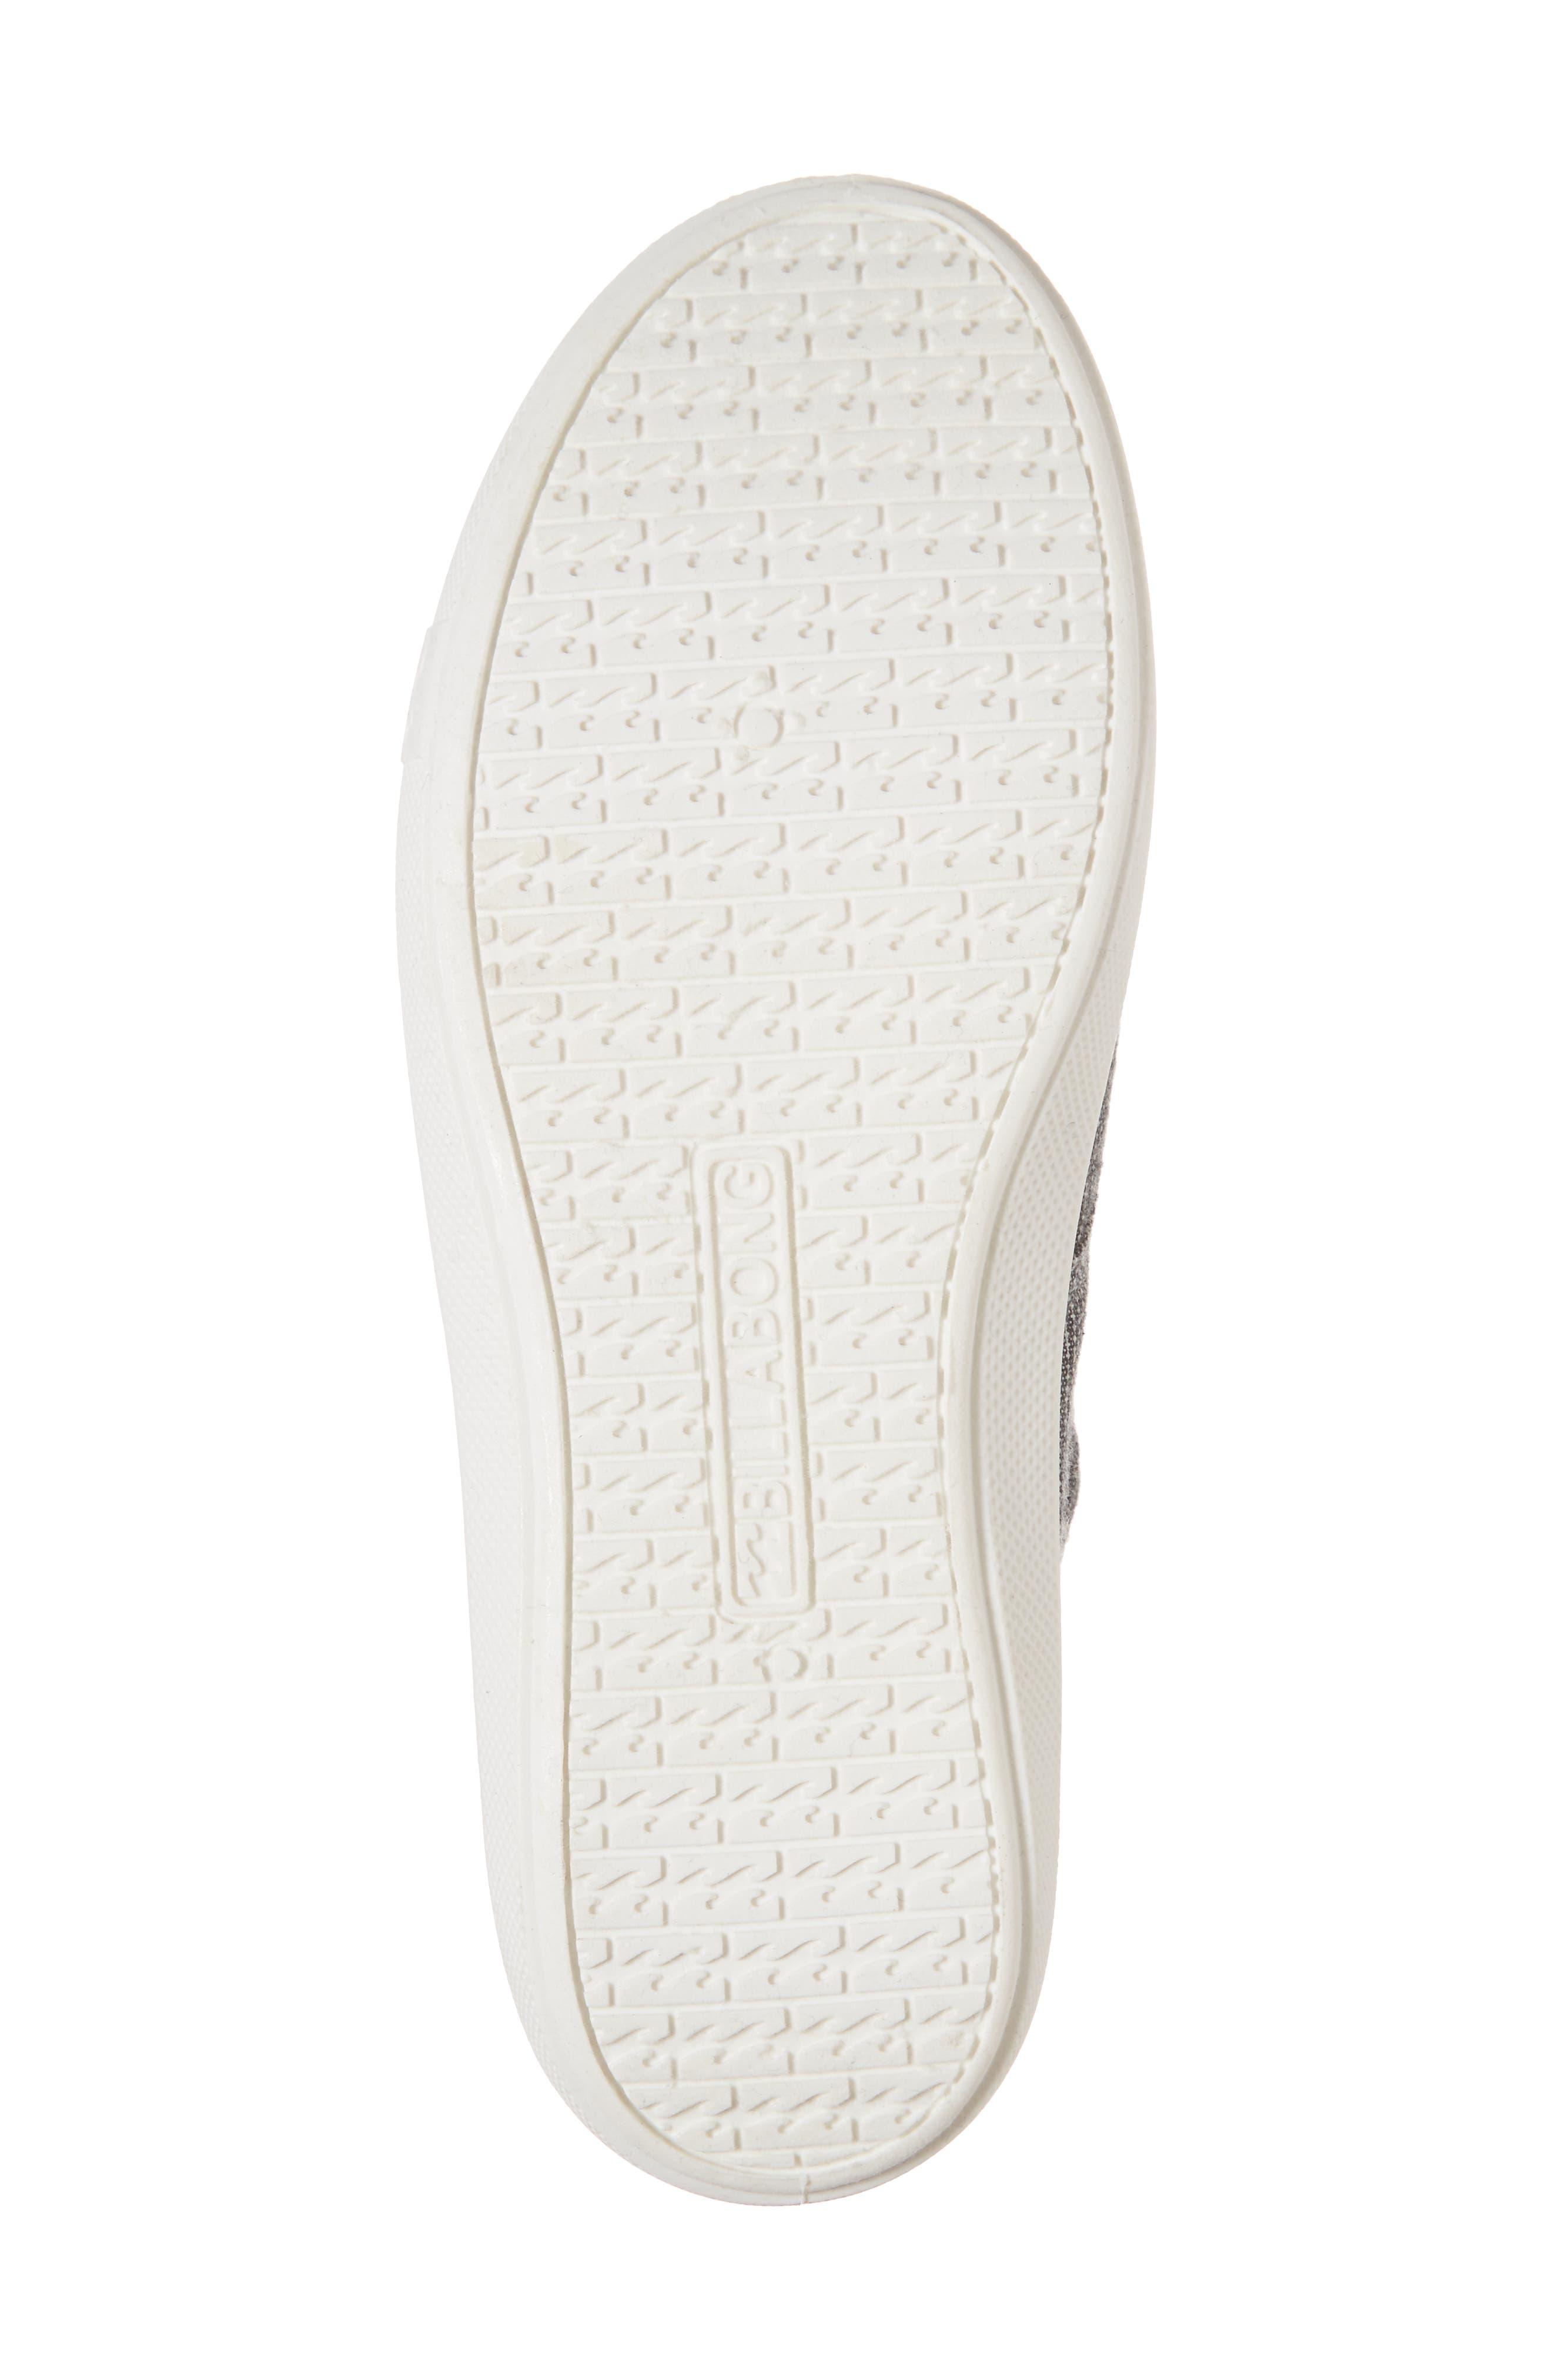 Addy Sneaker,                             Alternate thumbnail 6, color,                             Black/ White